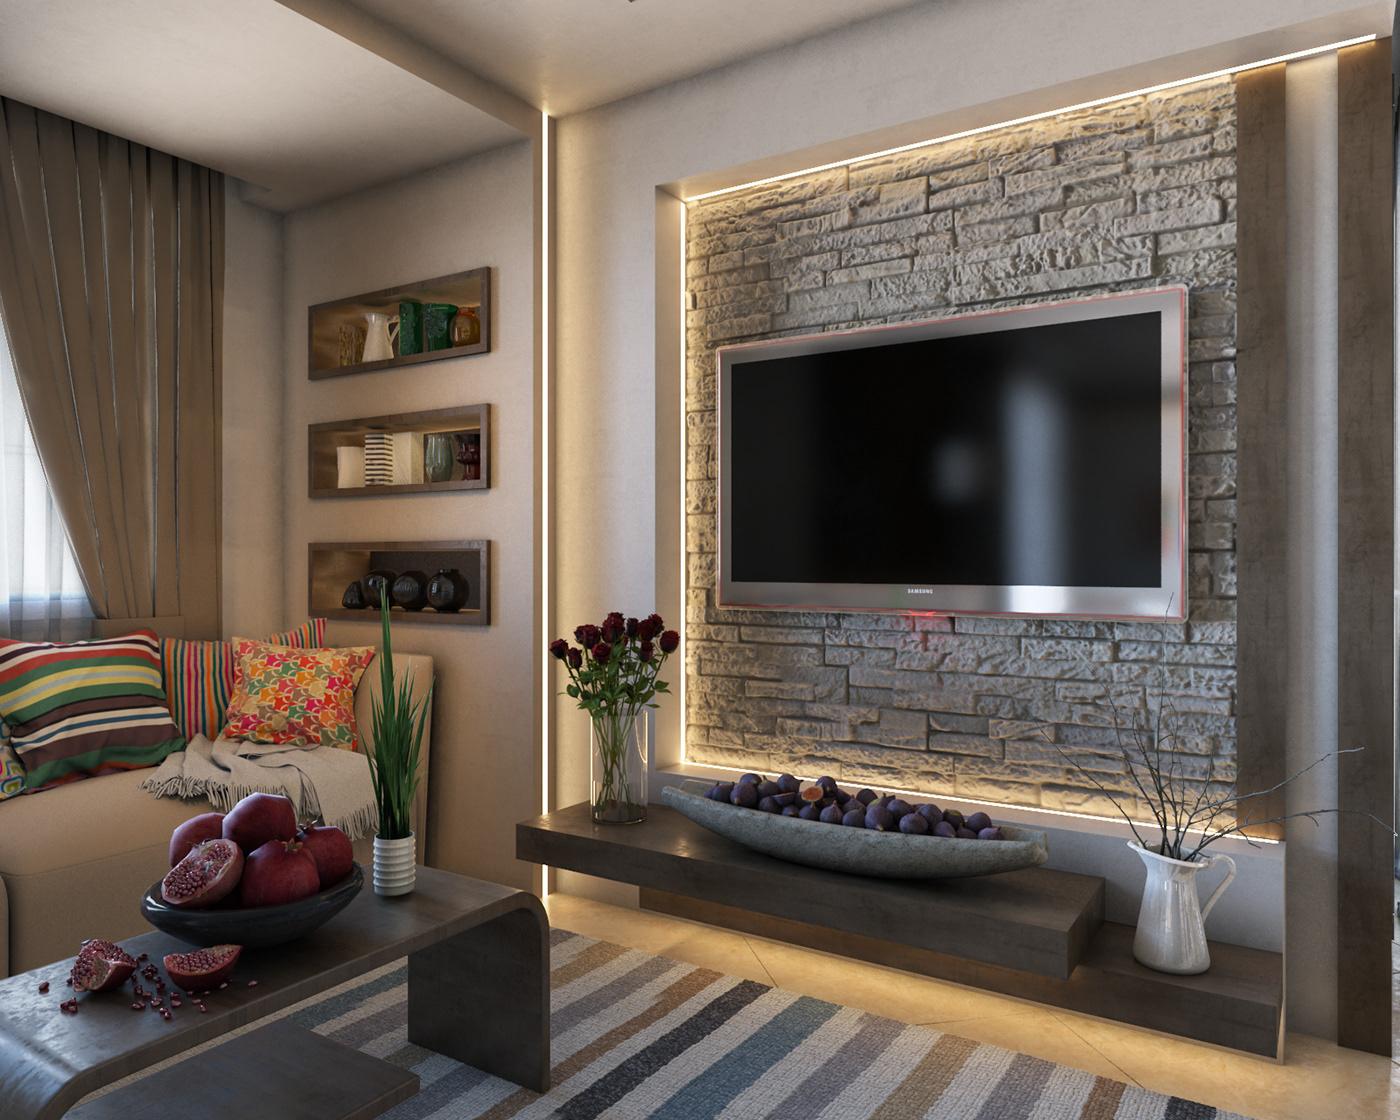 Interior design visualization 3ds max vray photoshop architecture graphics Motaz mostafa